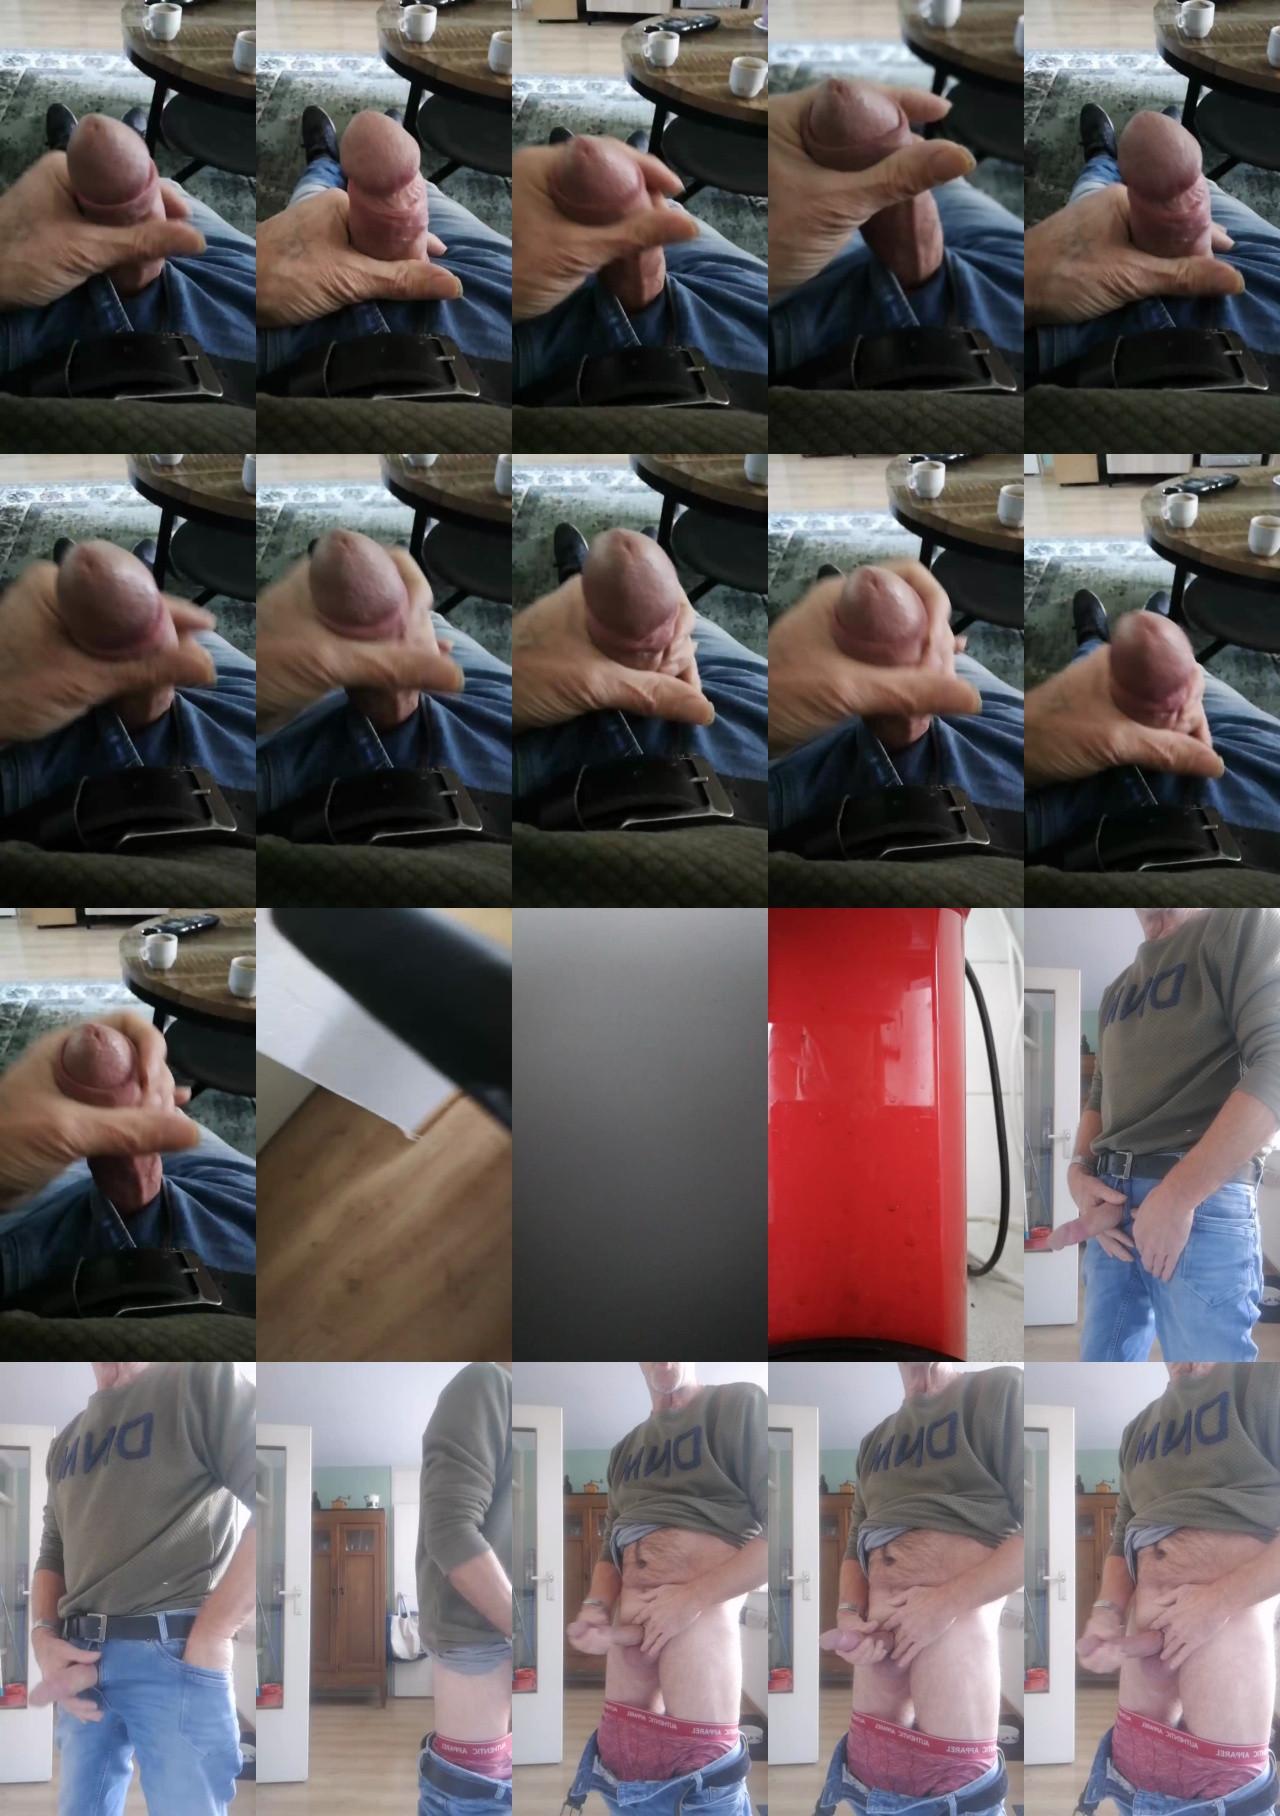 libido27 Cam4 23-11-2020 Recorded Video Cam